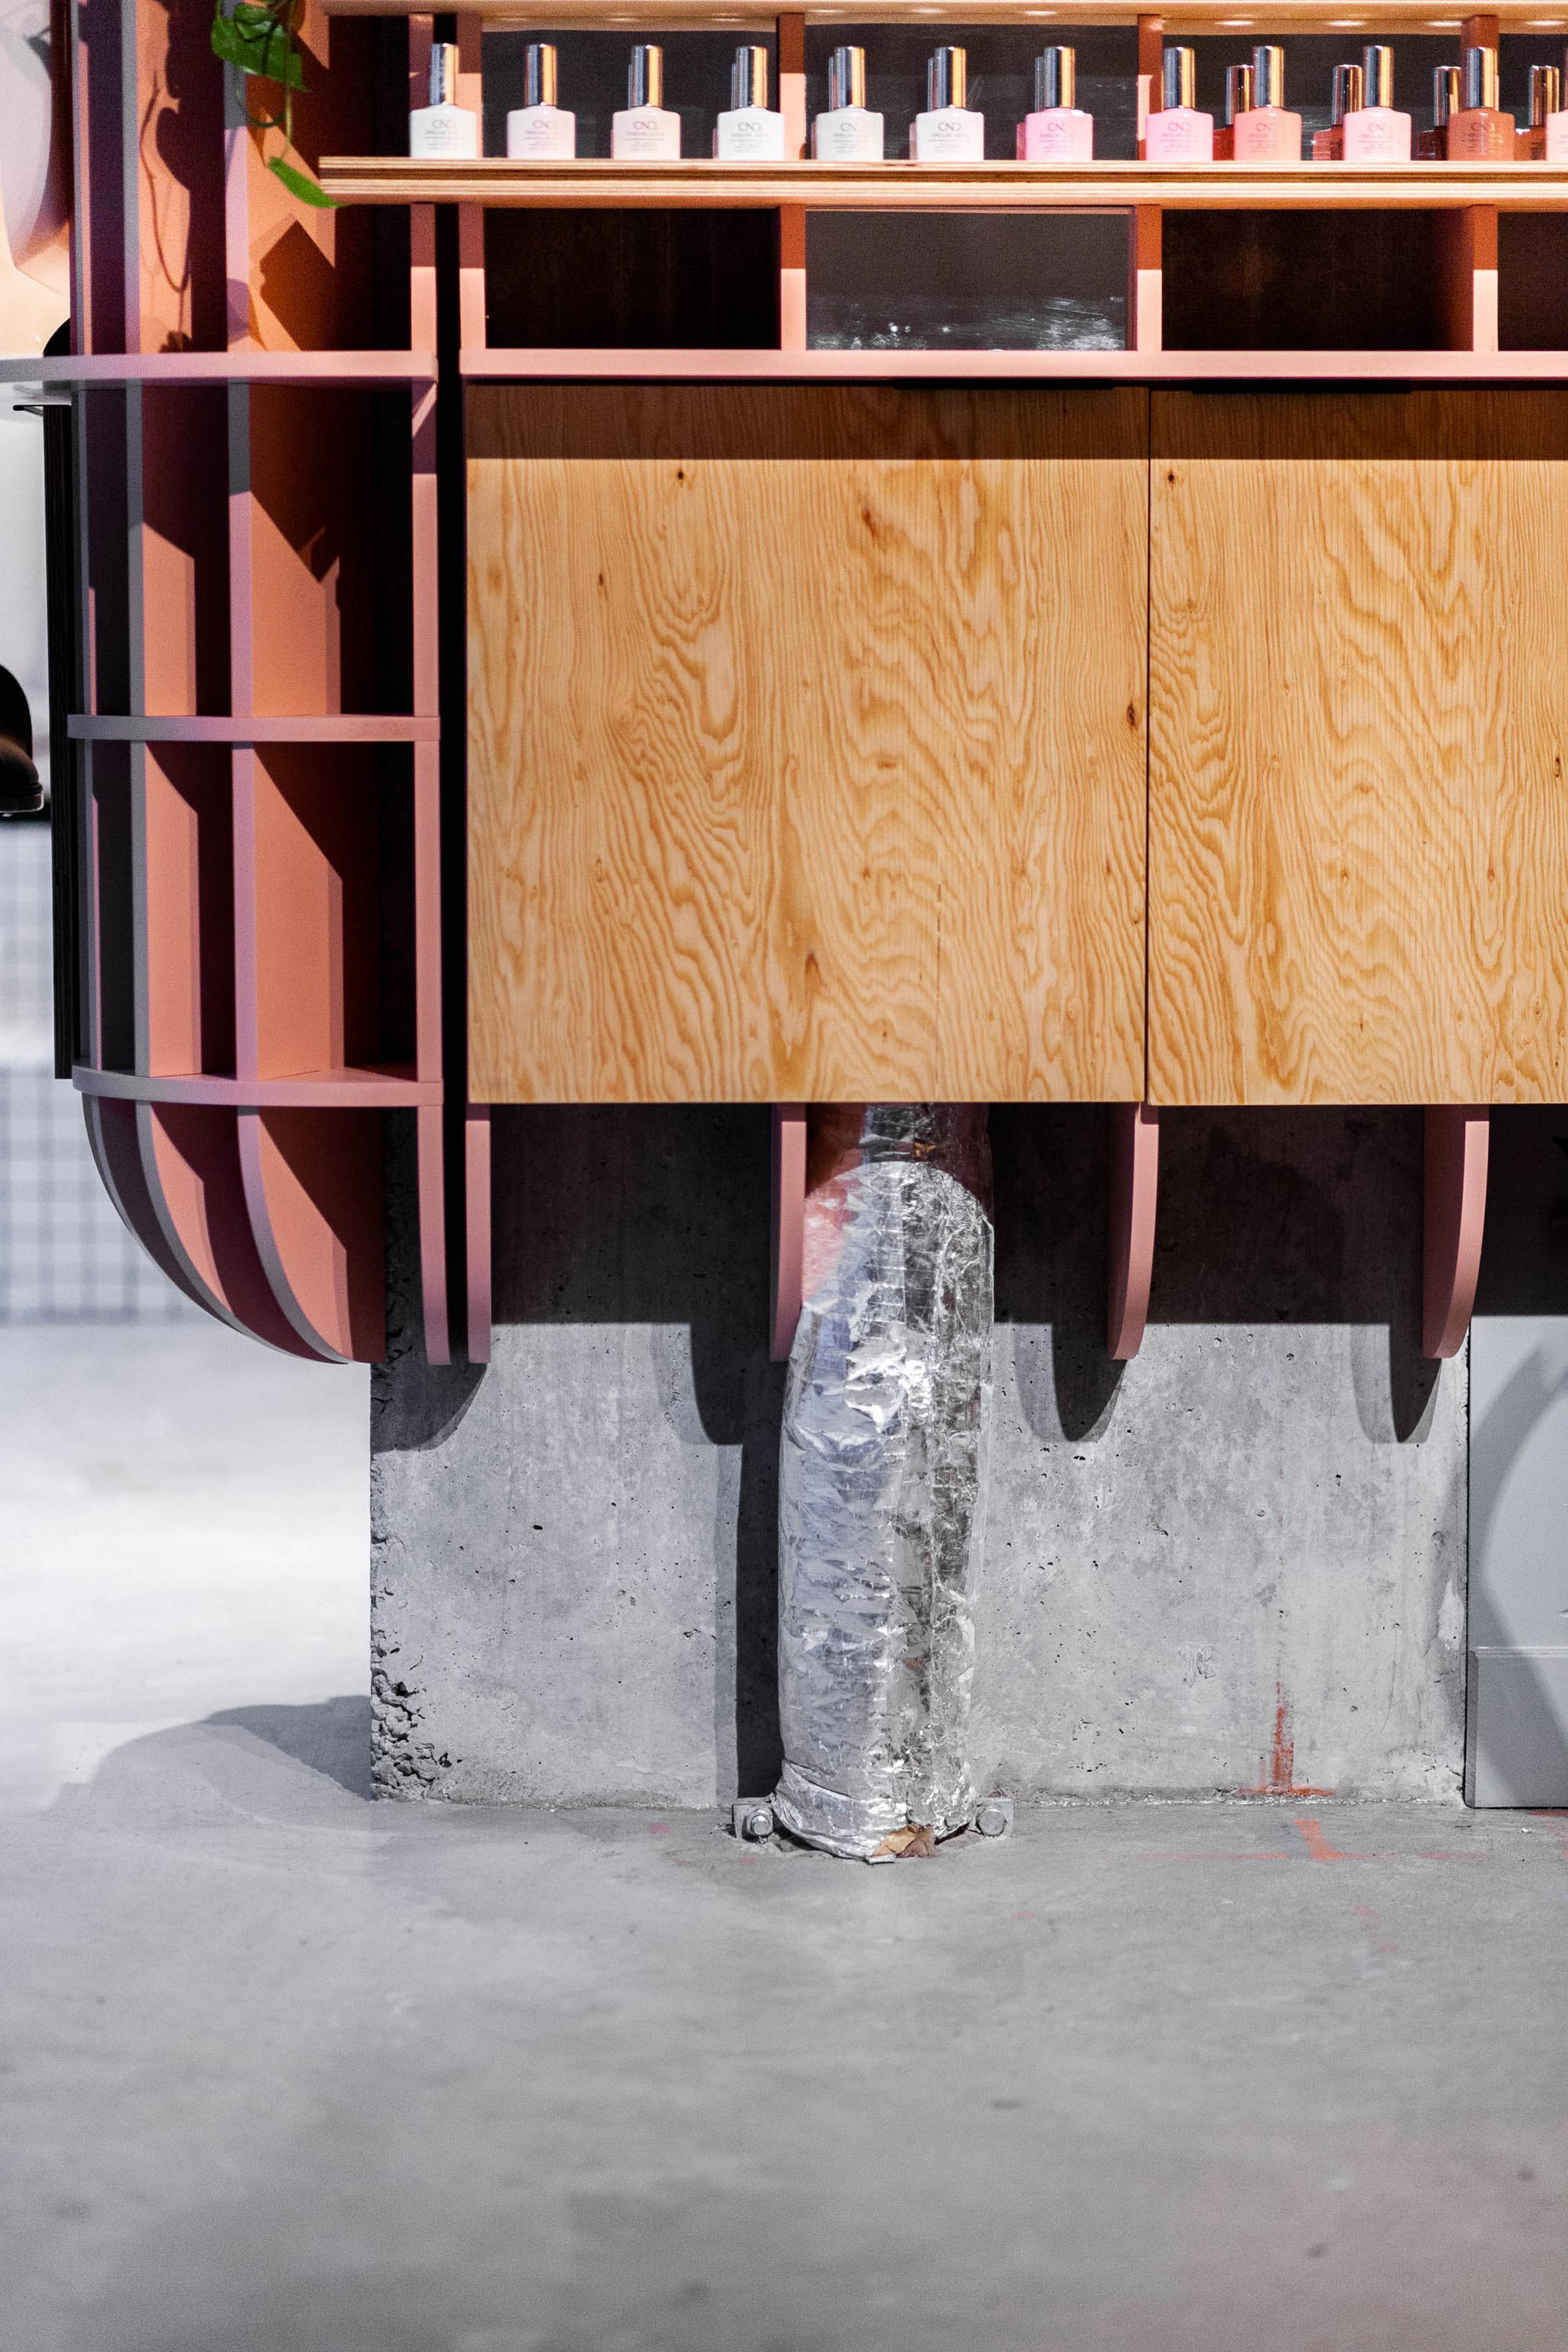 Le Hideout by Ménard Dworkind architecture and design